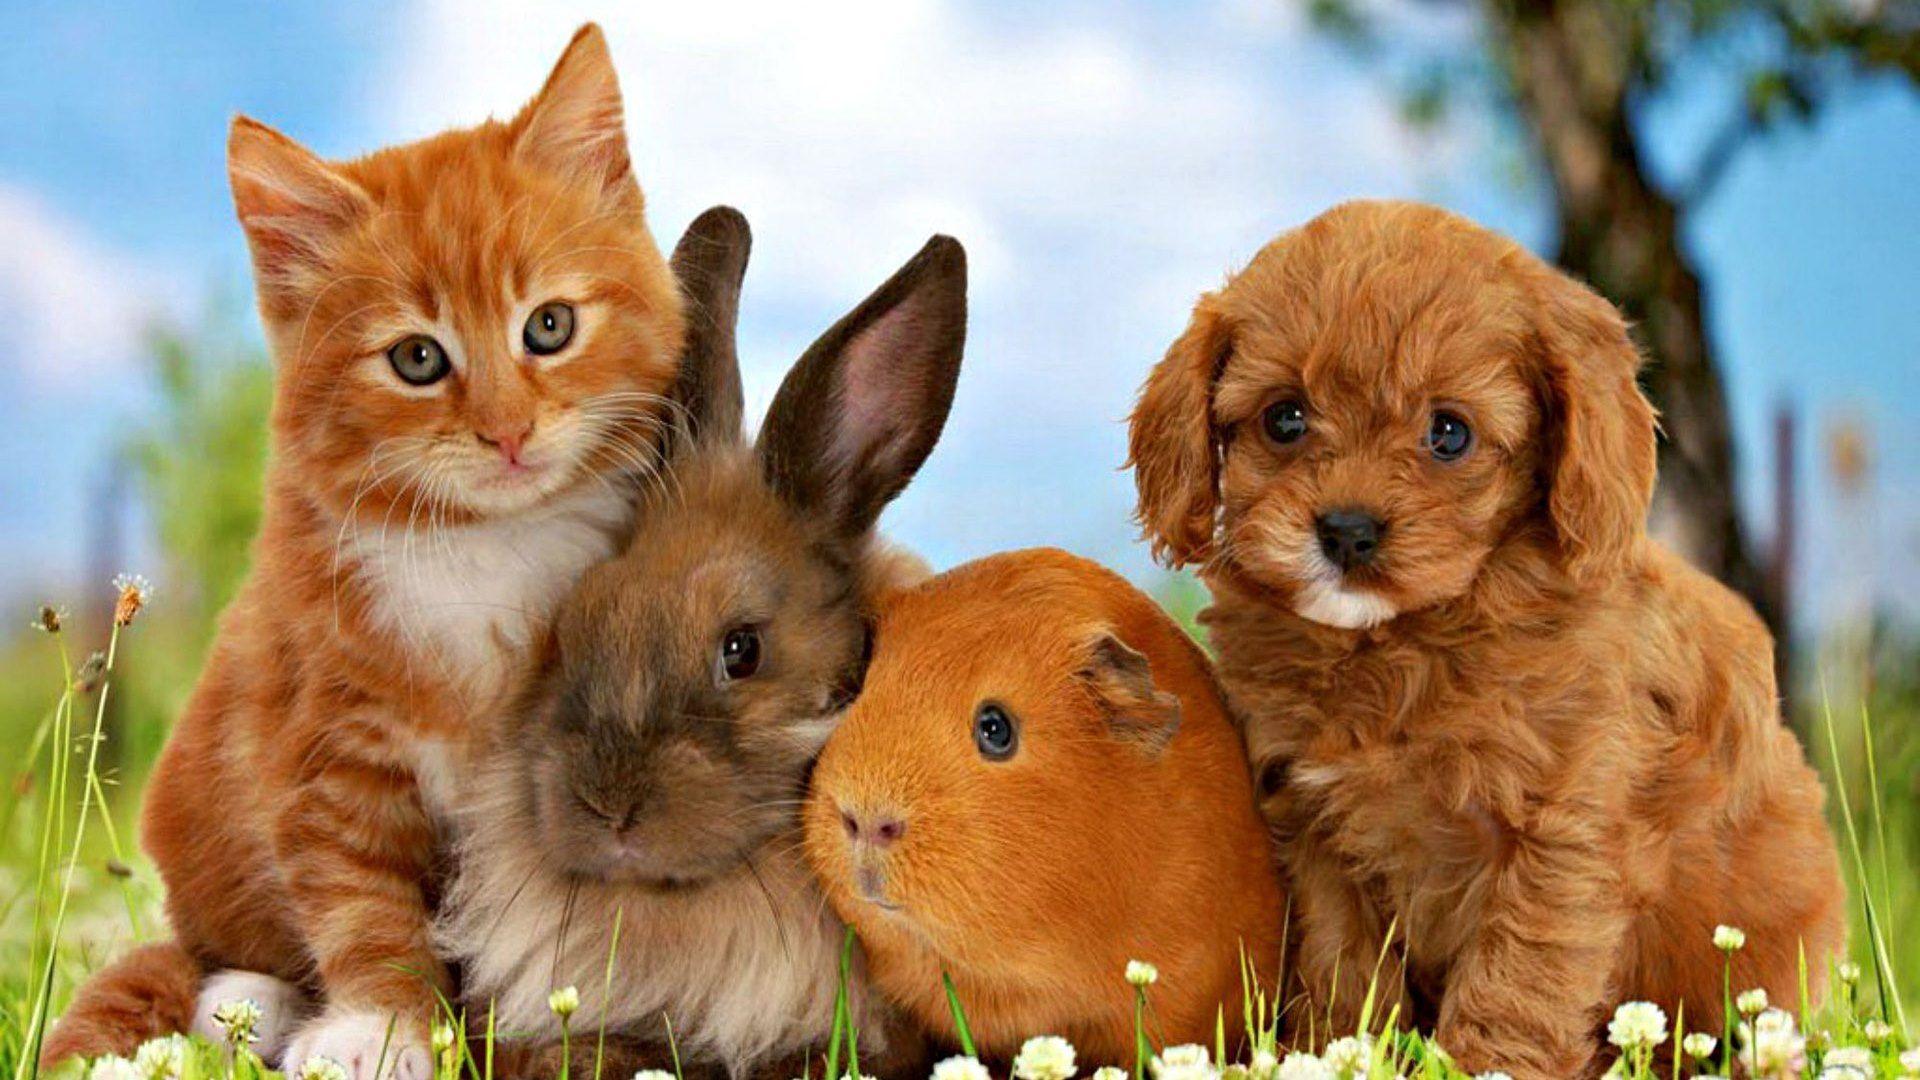 Puppy And Kitten free hd wallpaper